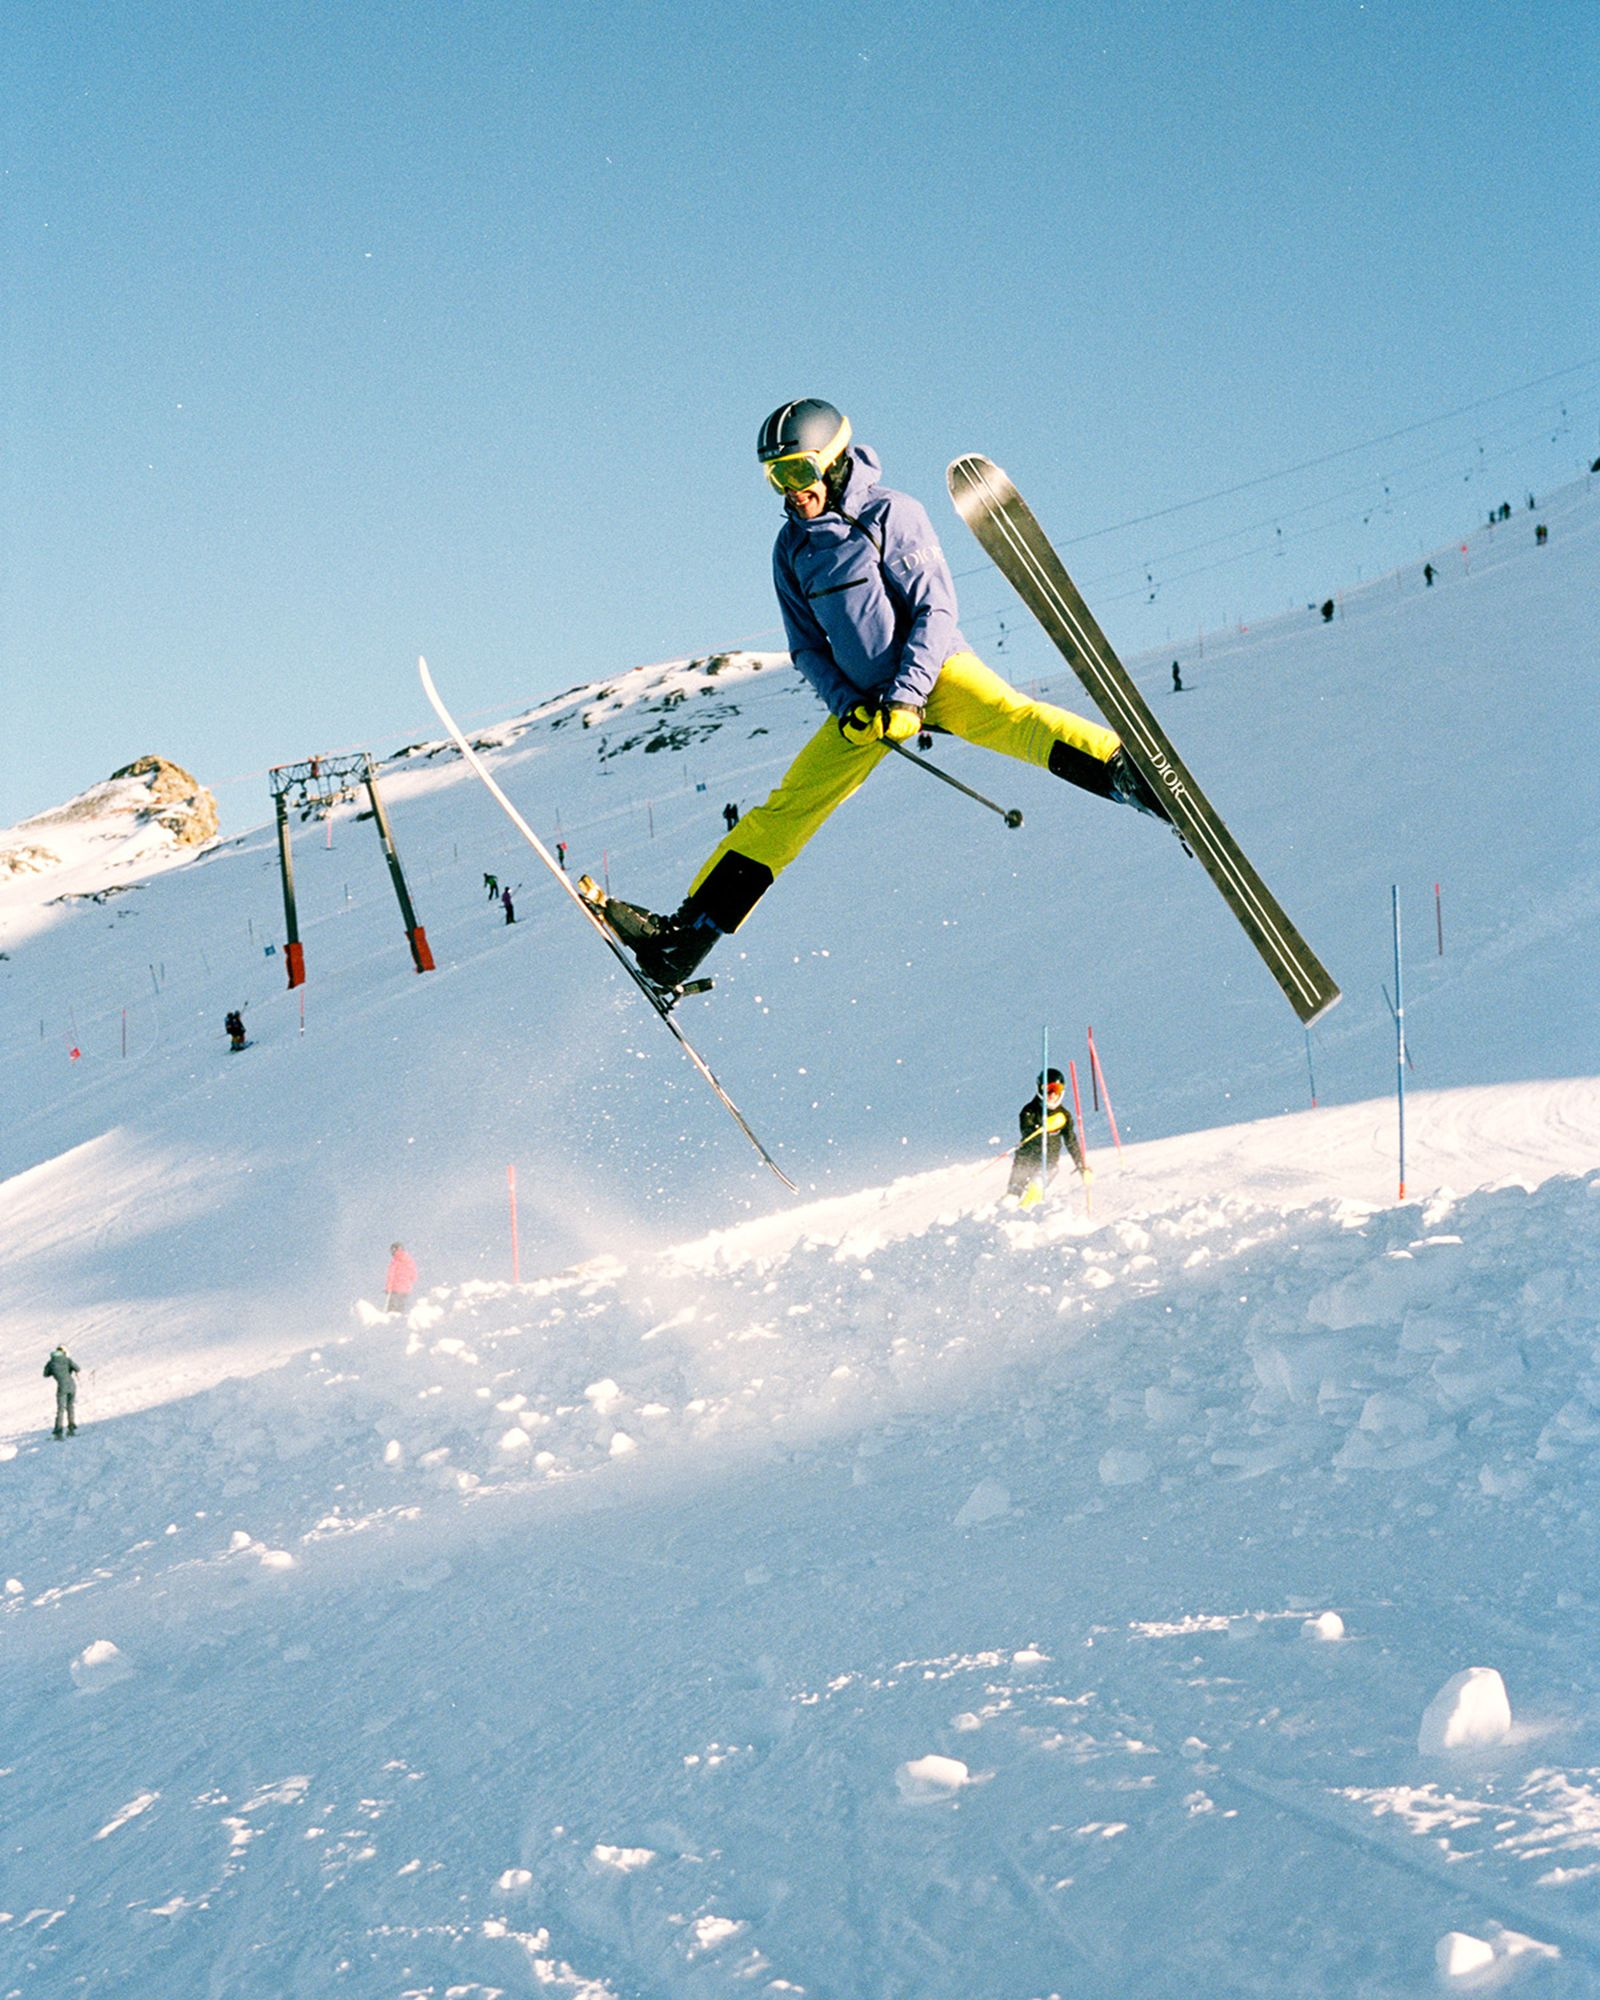 dior-ski-capsule-06